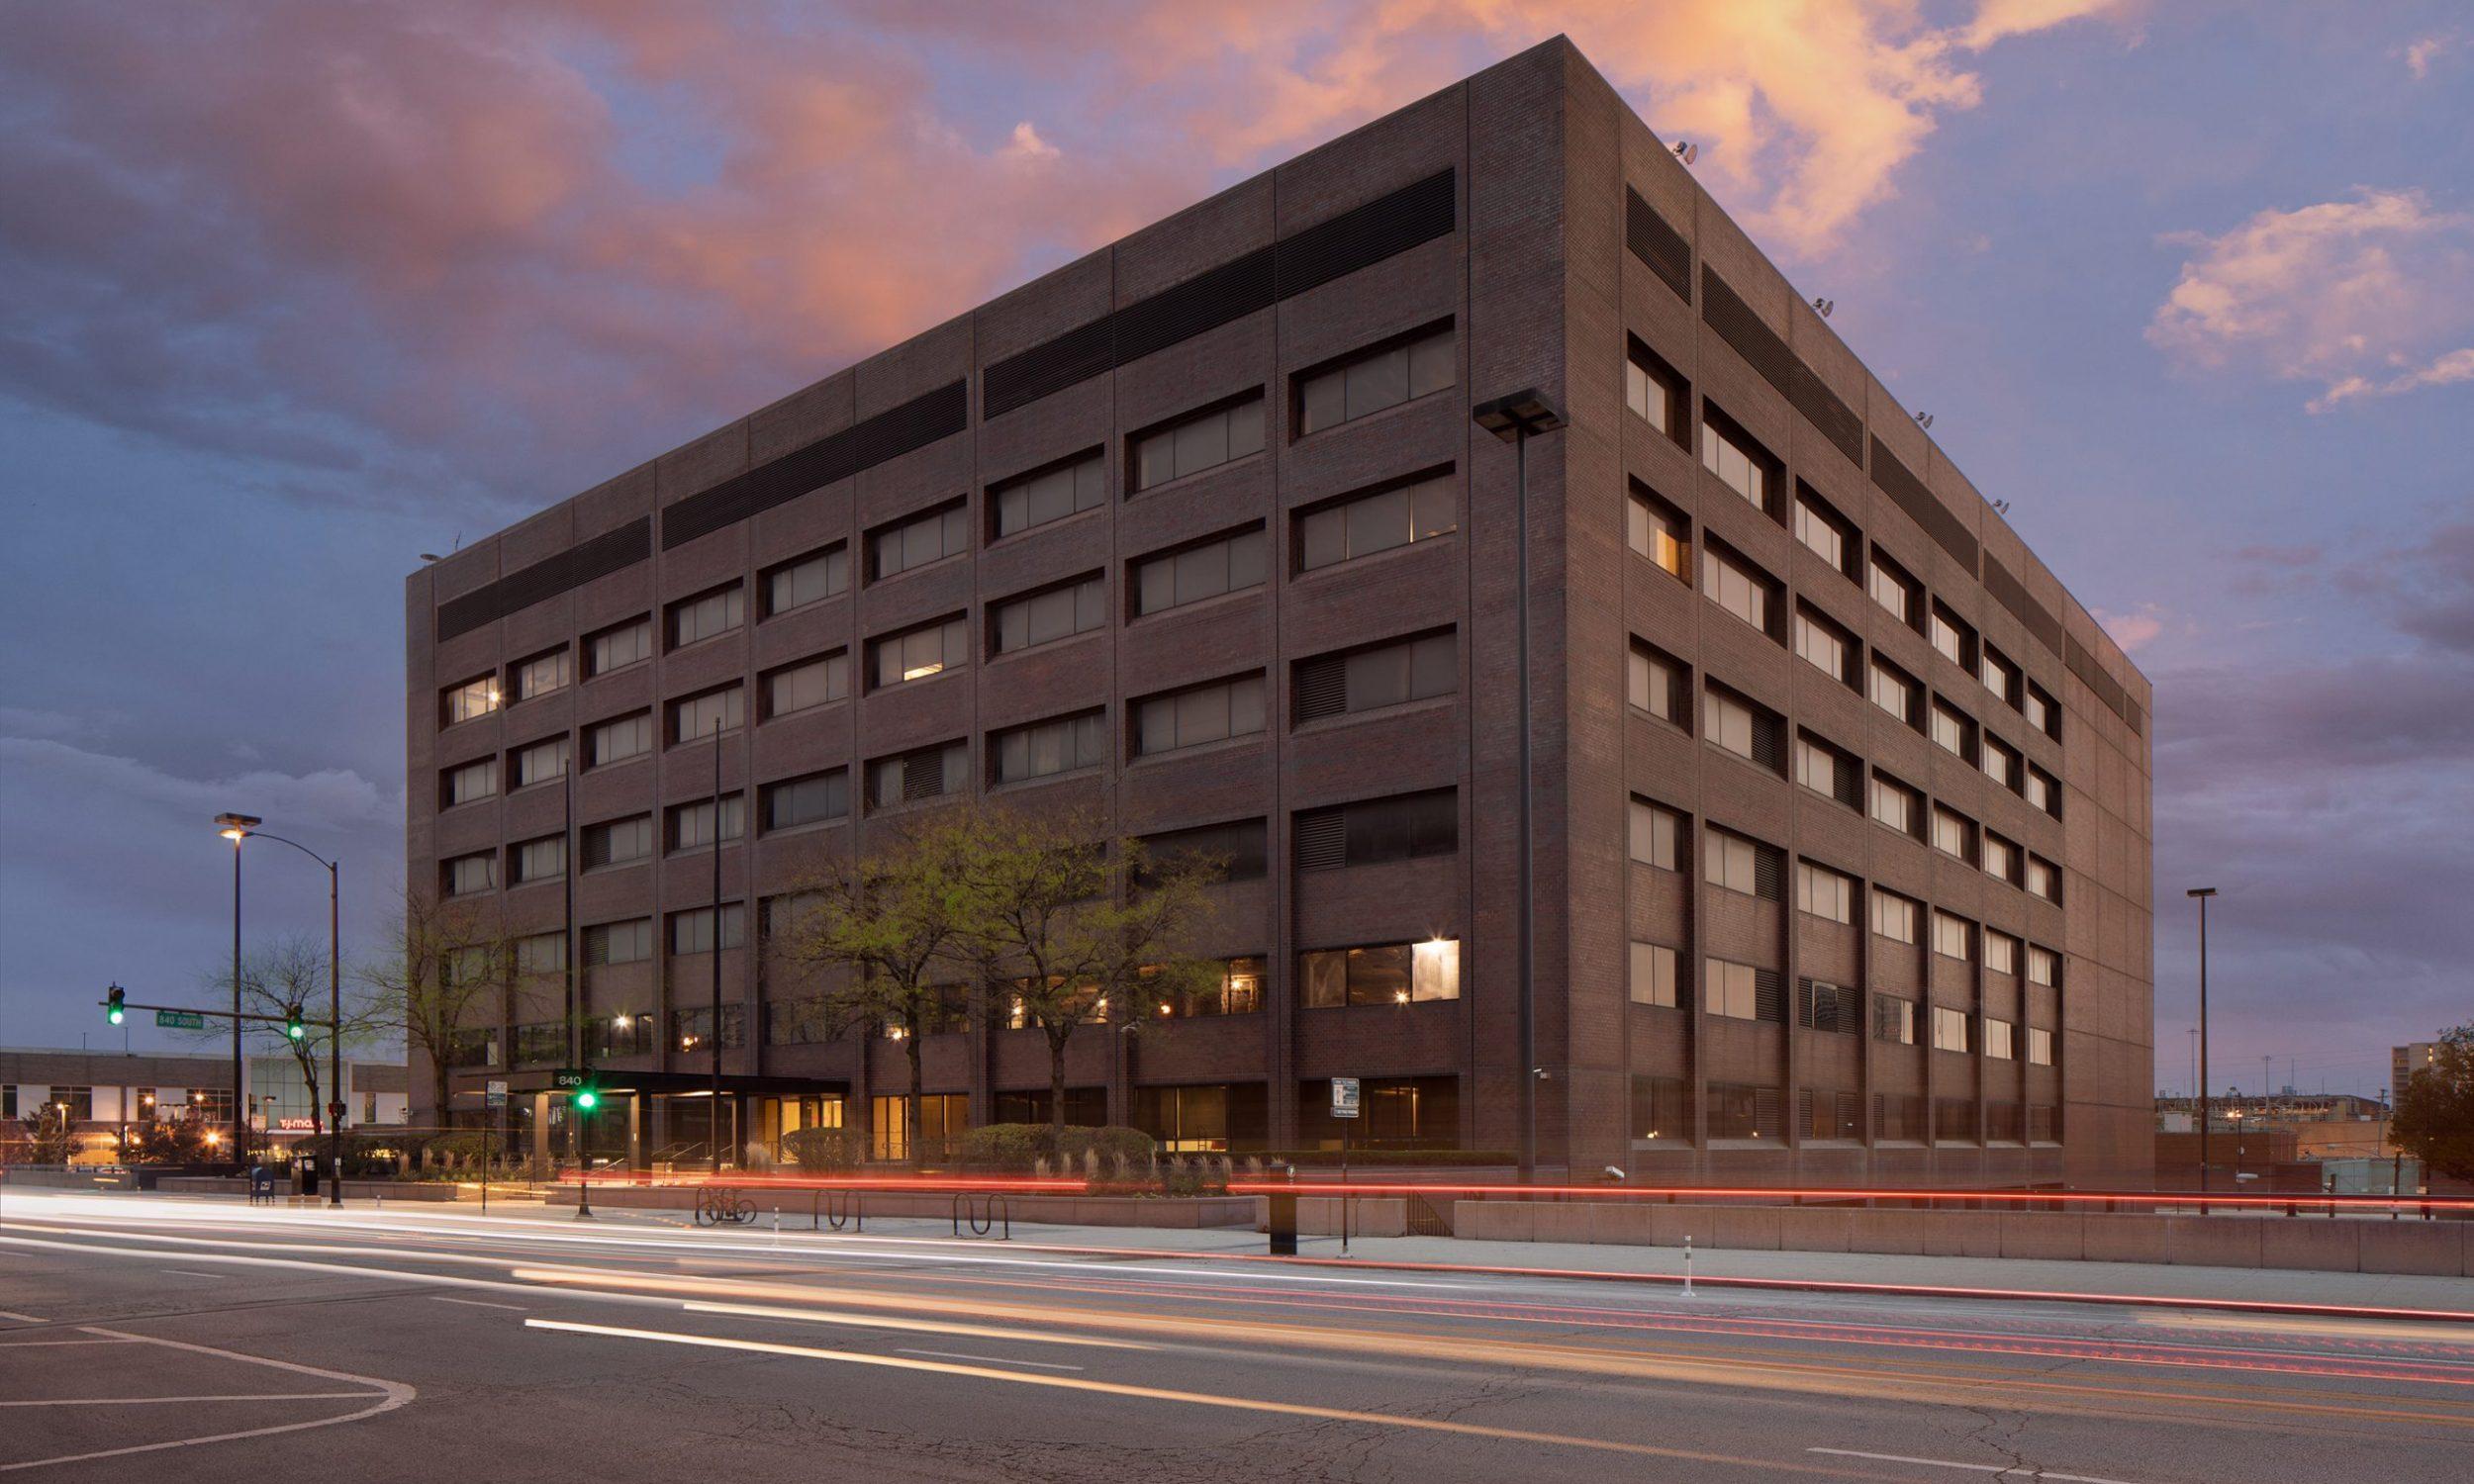 Serverfarm, technology, industrial, Chicago, Illinois, IL, architectural, photography, data center